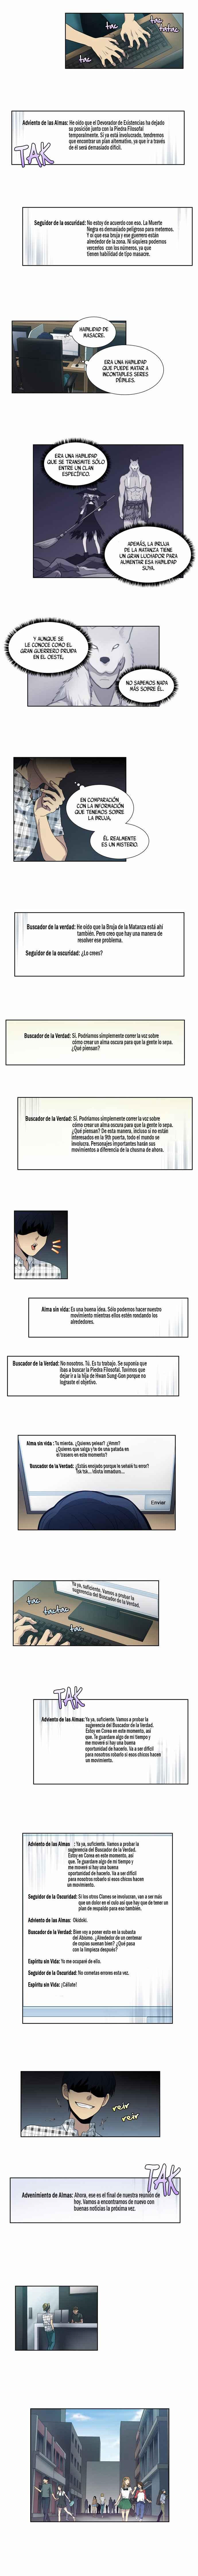 http://c5.ninemanga.com/es_manga/61/1725/364501/3d1694baba5418571bd3ba780d667ec6.jpg Page 5